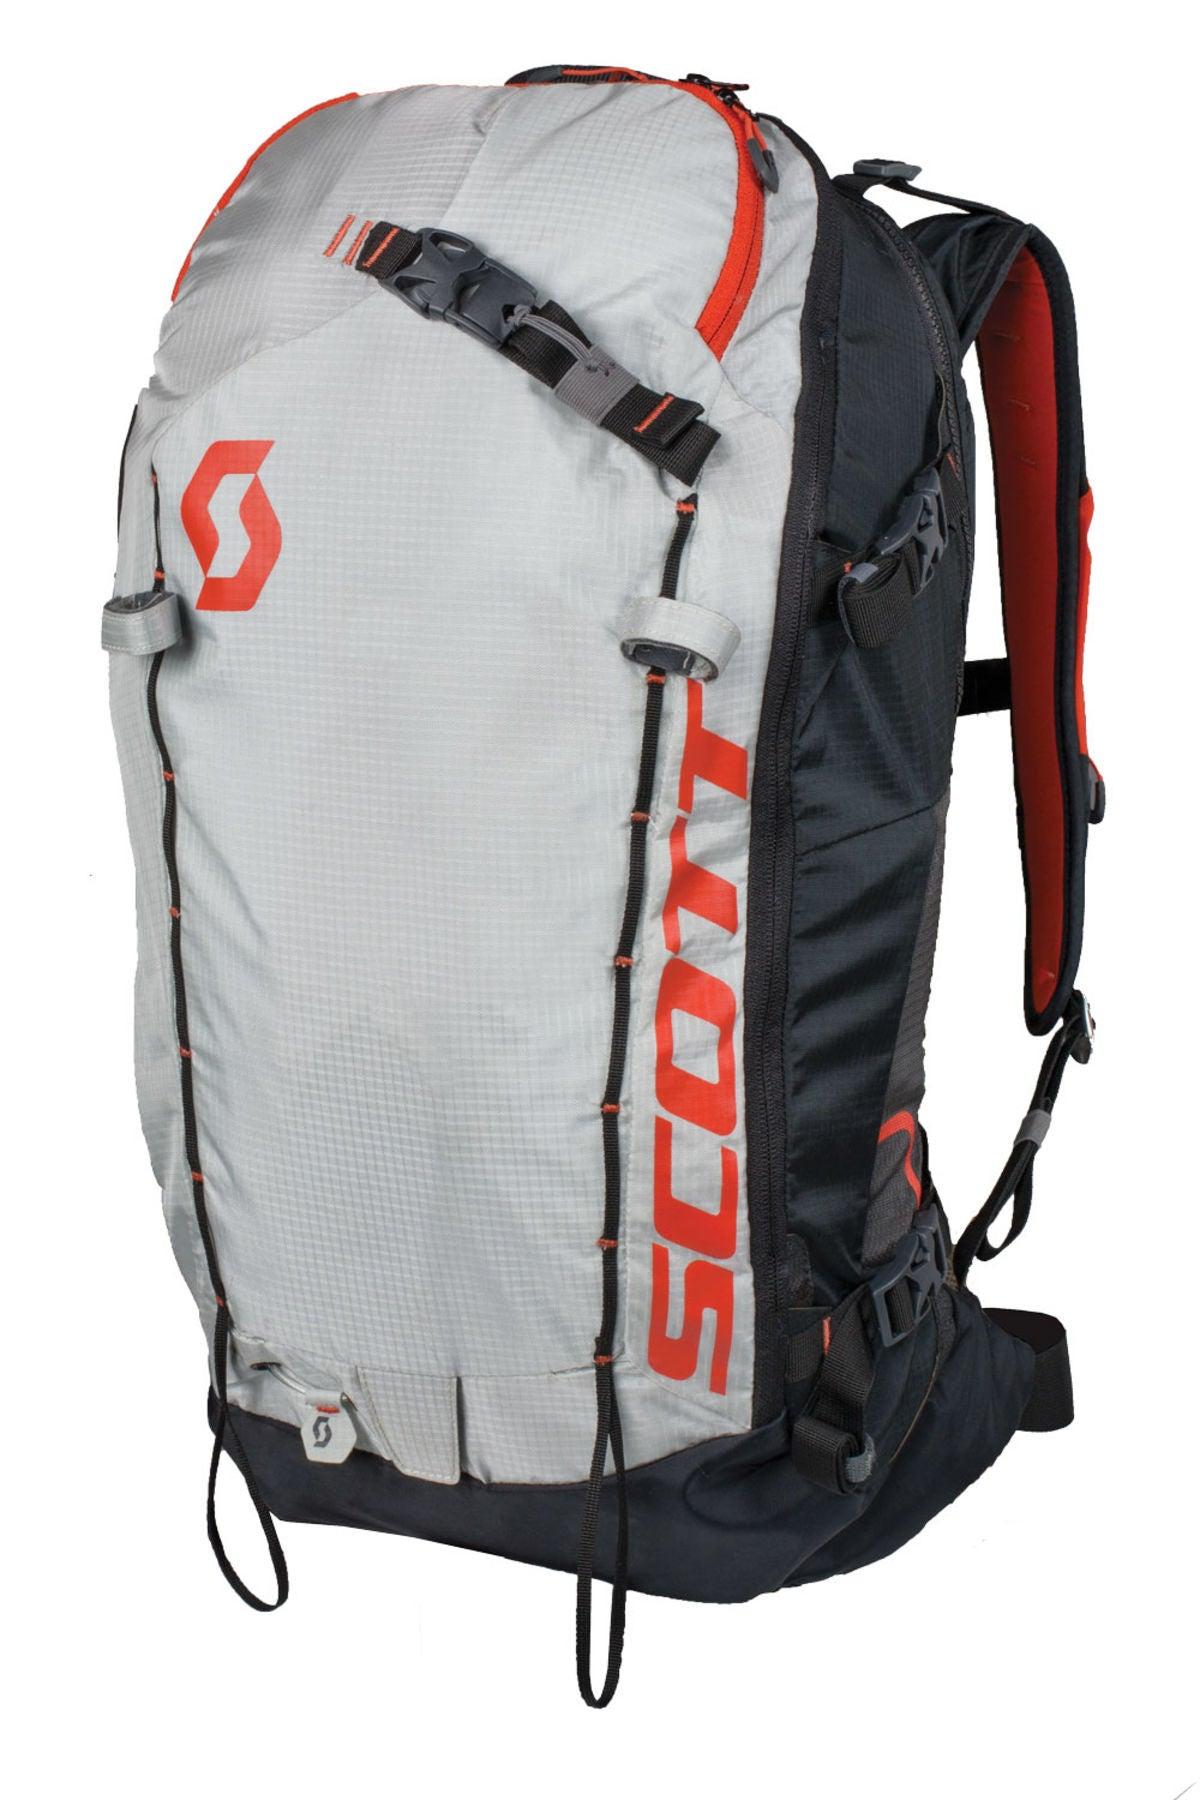 Scott Backcountry Patrol AP30 Pack